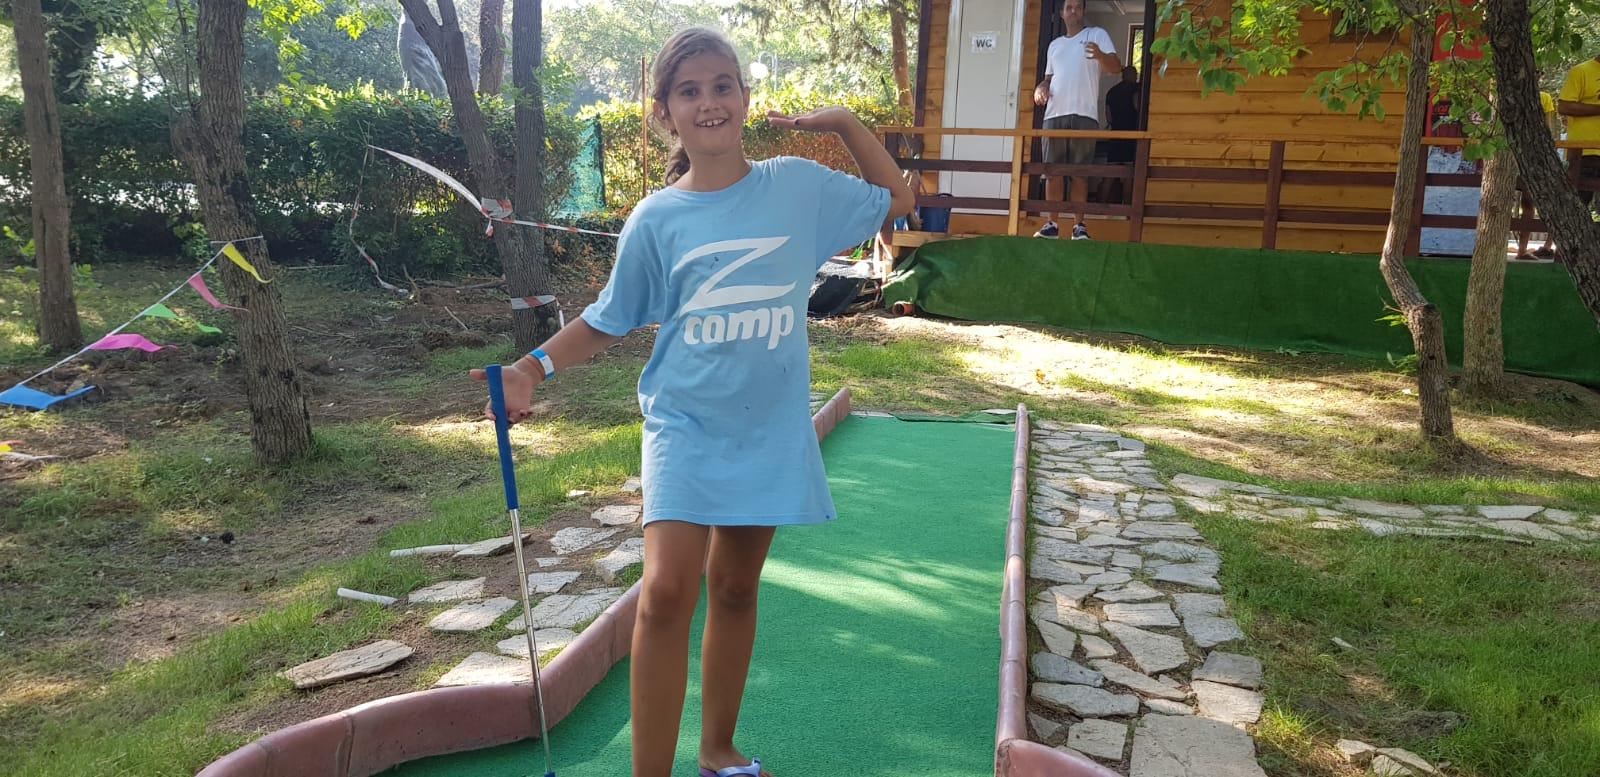 Z camp, day 19 - mini golf in Tsarevo - girl with T-shirt of Z camp